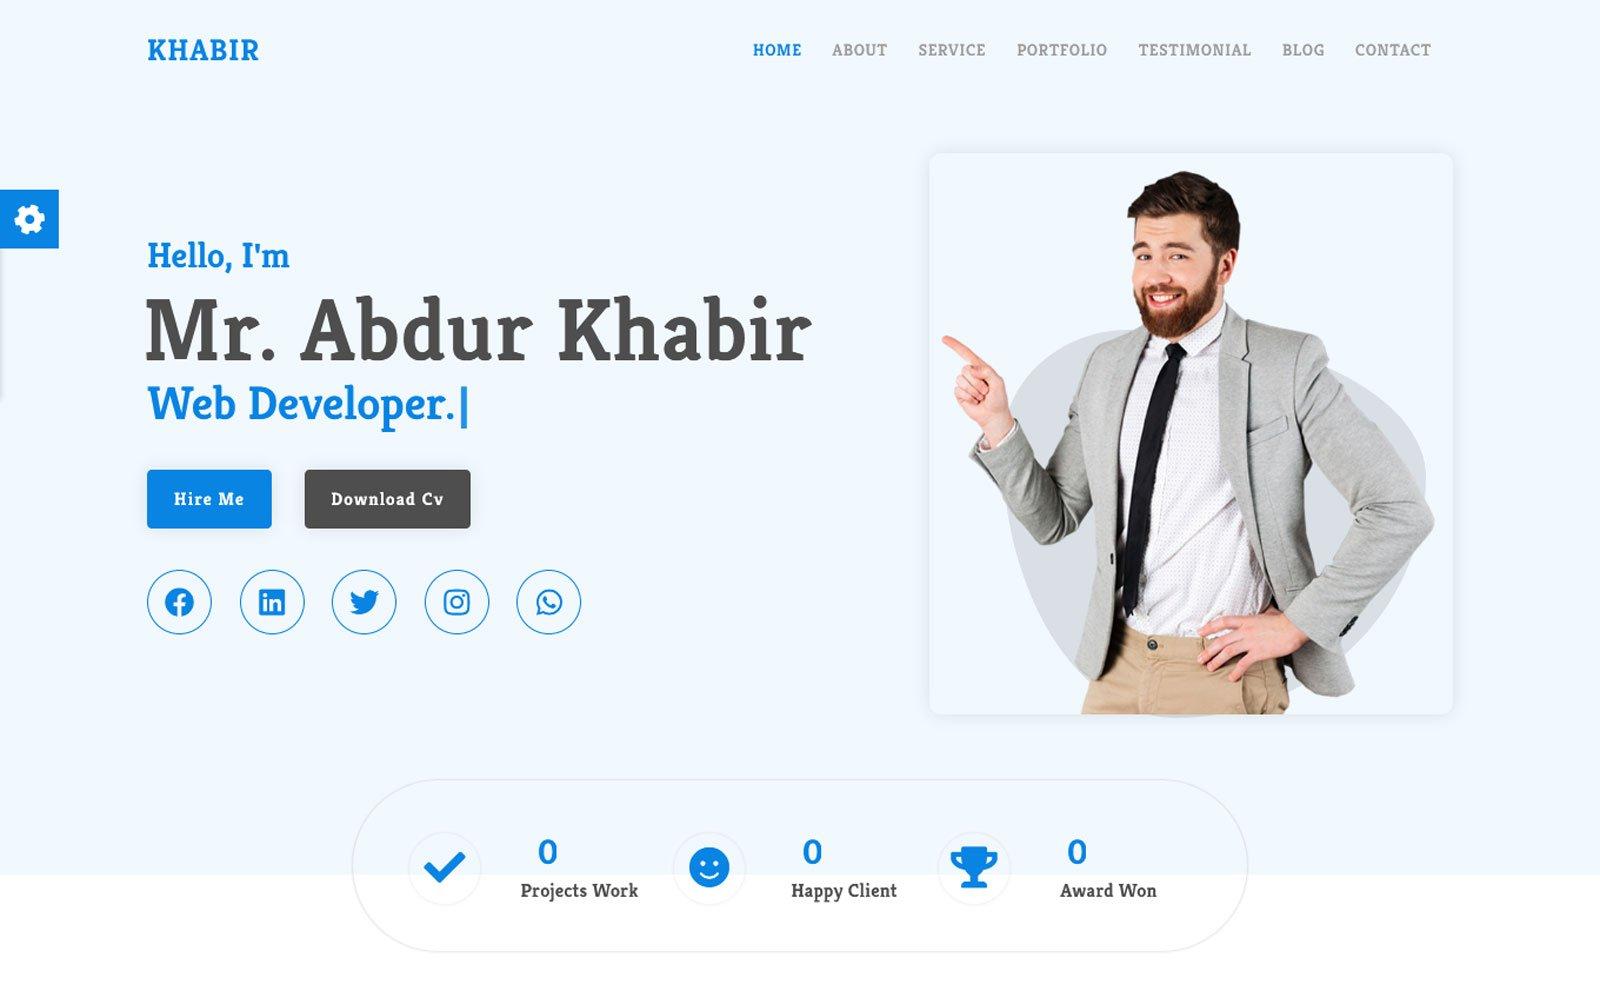 Al-Khabir - Creative Portfolio CV/Resume Templates de Landing Page №122887